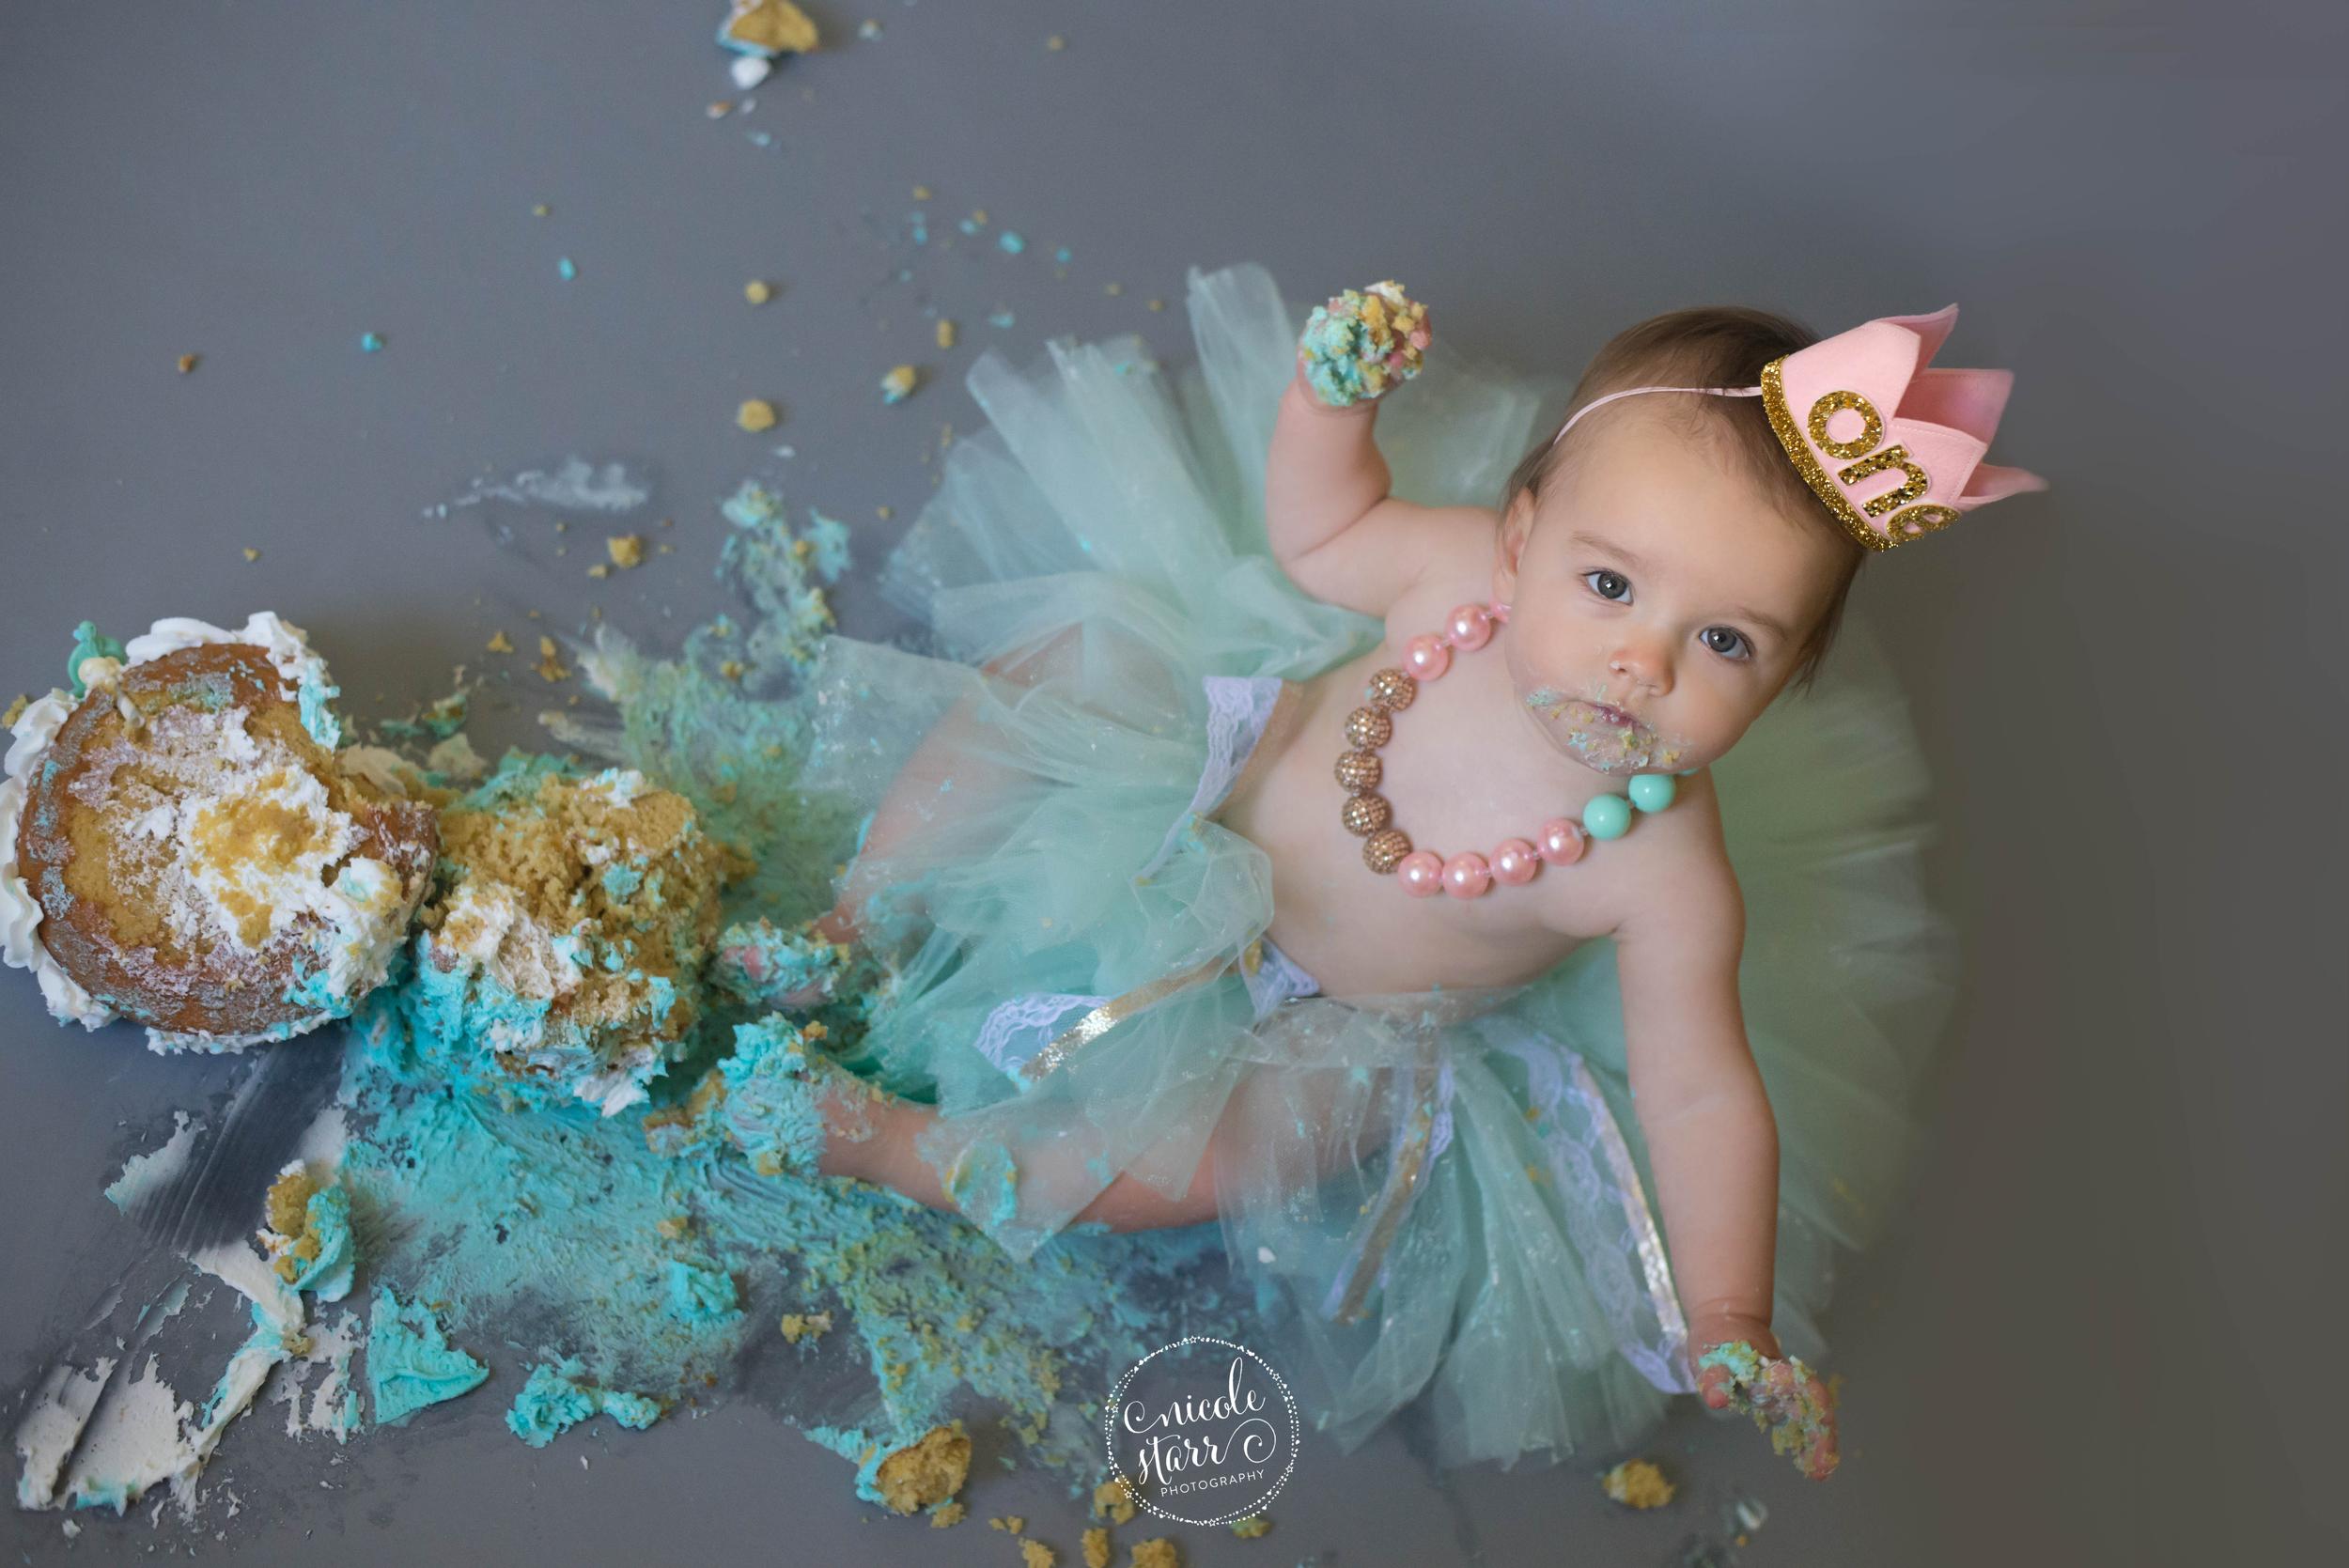 baby cake smash birthday photo session